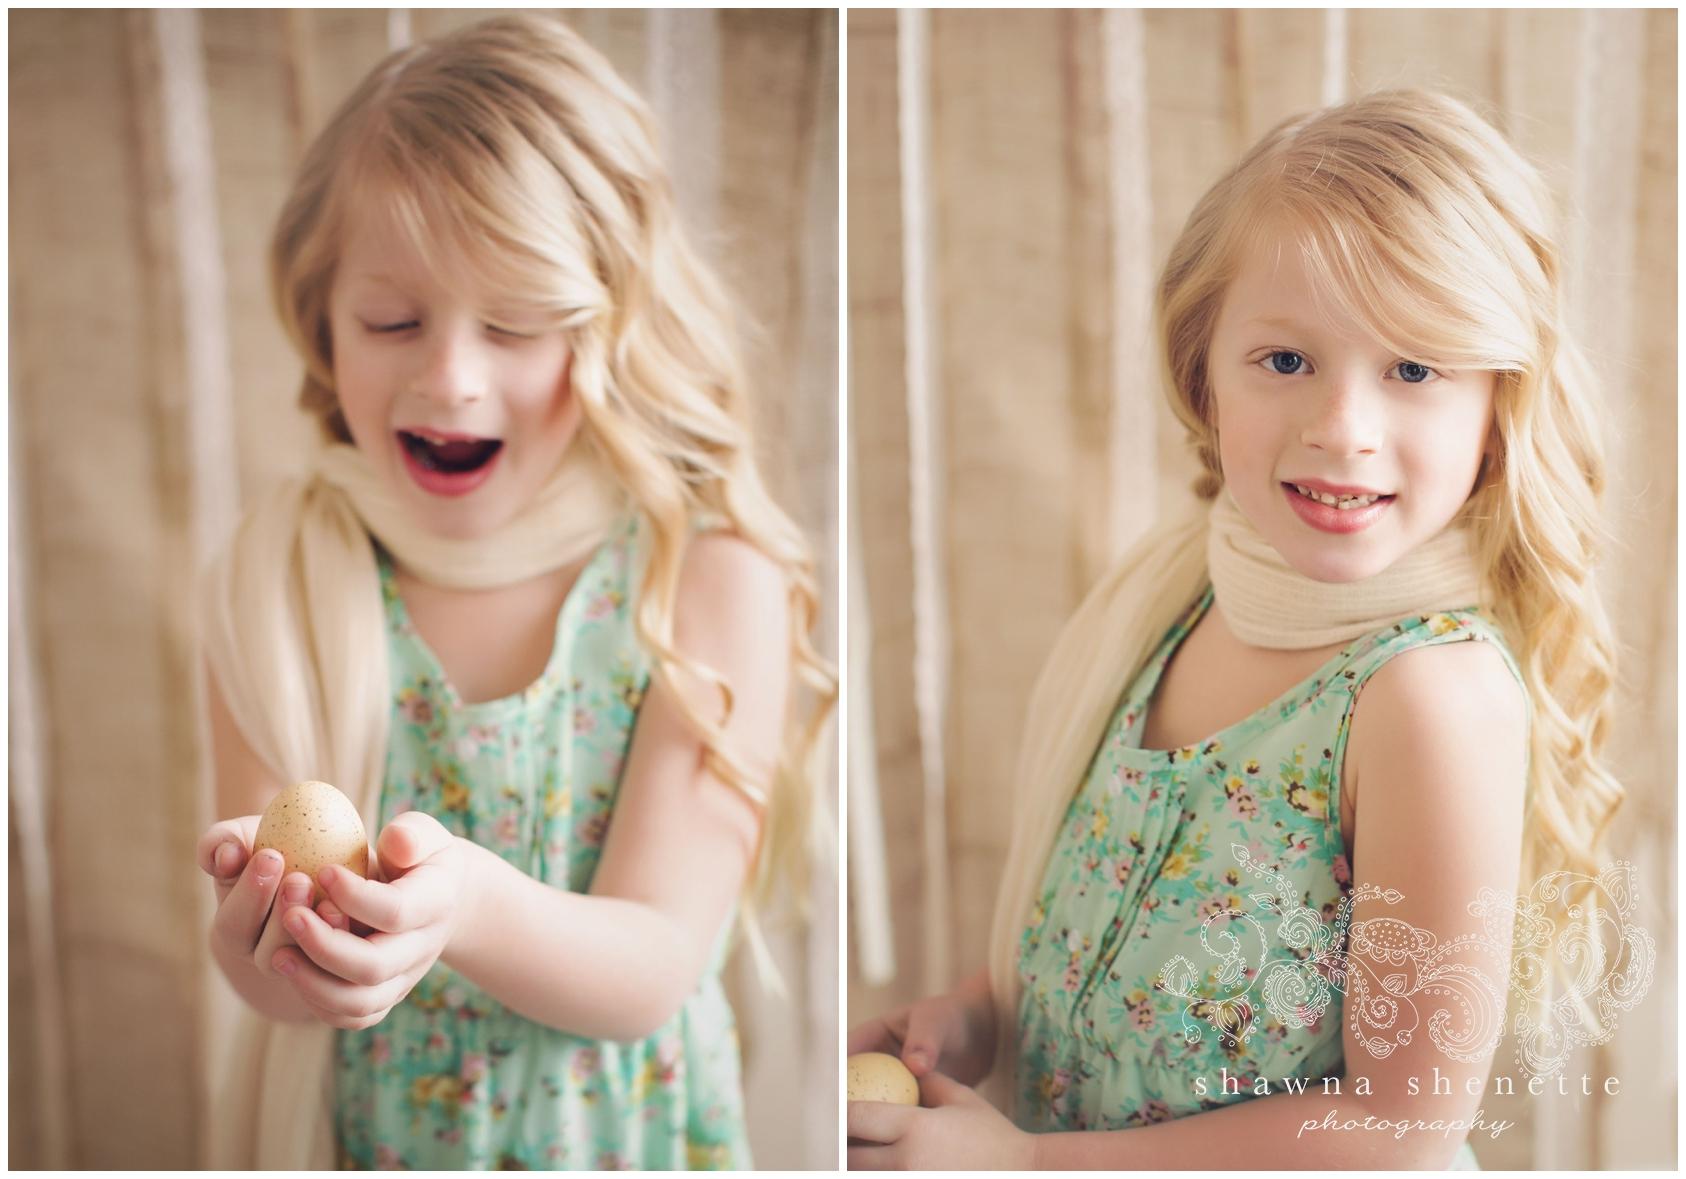 2014 Easter Mini Sessions Massachusetts Photographer Child Photos Easter Portraits Children Millbury